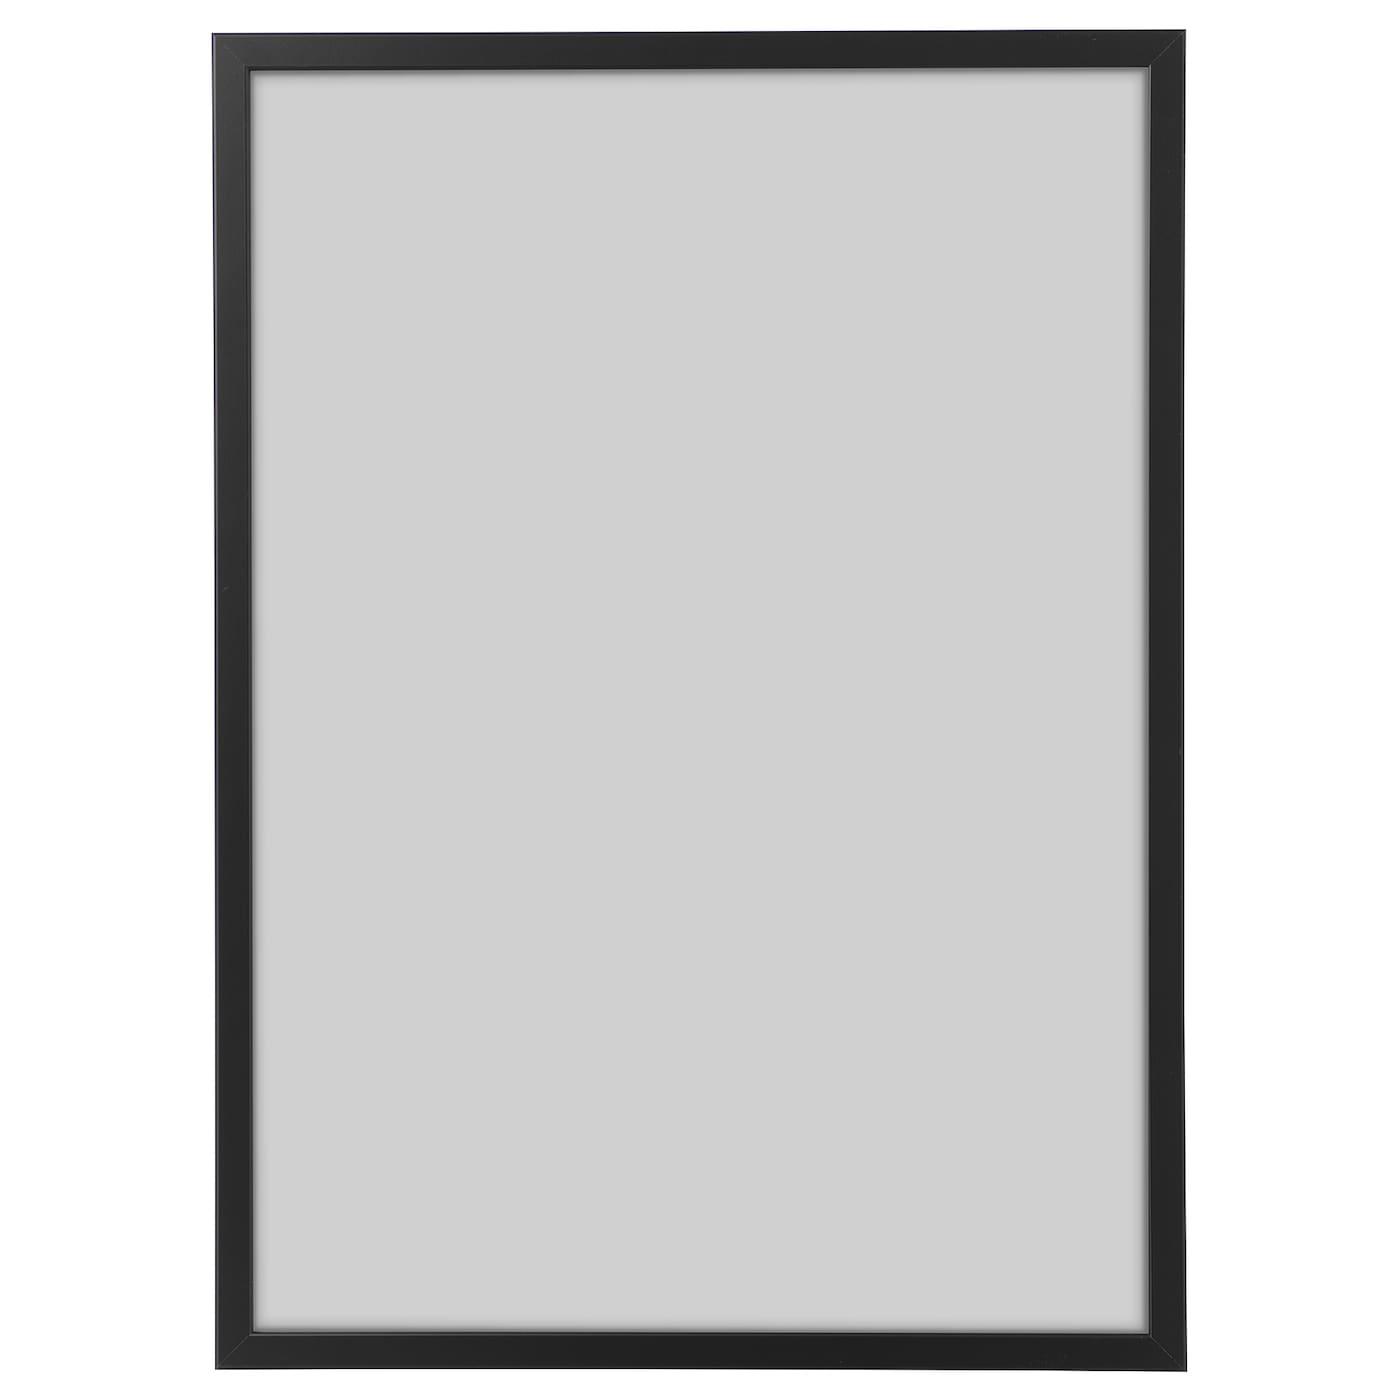 fiskbo cadre noir 50 x 70 cm ikea. Black Bedroom Furniture Sets. Home Design Ideas